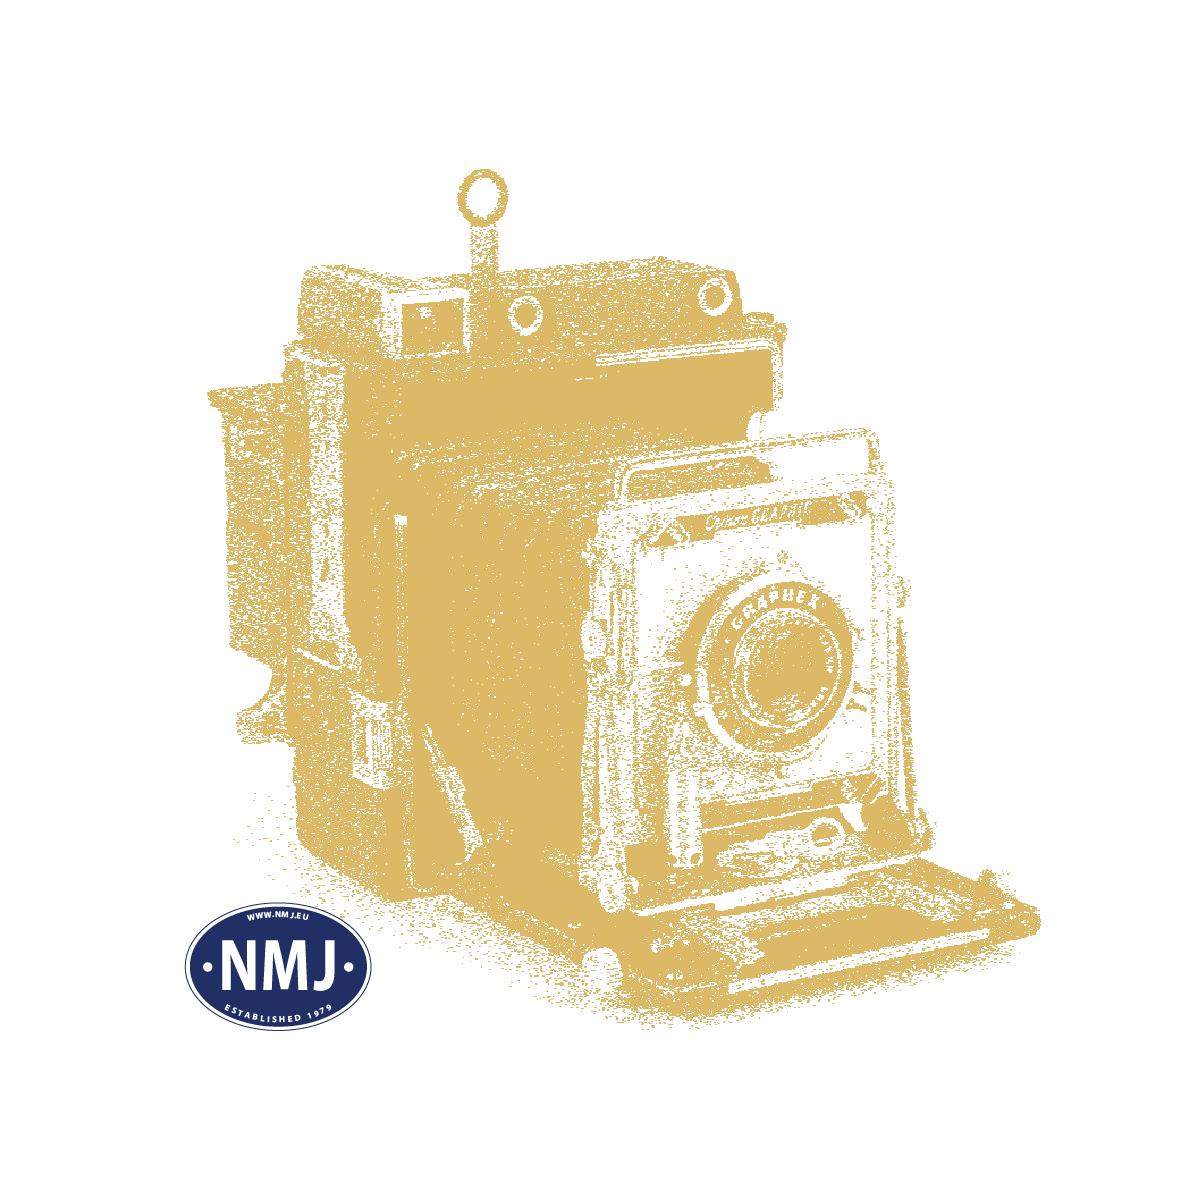 NMJT83.990 - NMJ Topline Skd 224 hovedprint m/ Dekoder, Kondesator & Hjul